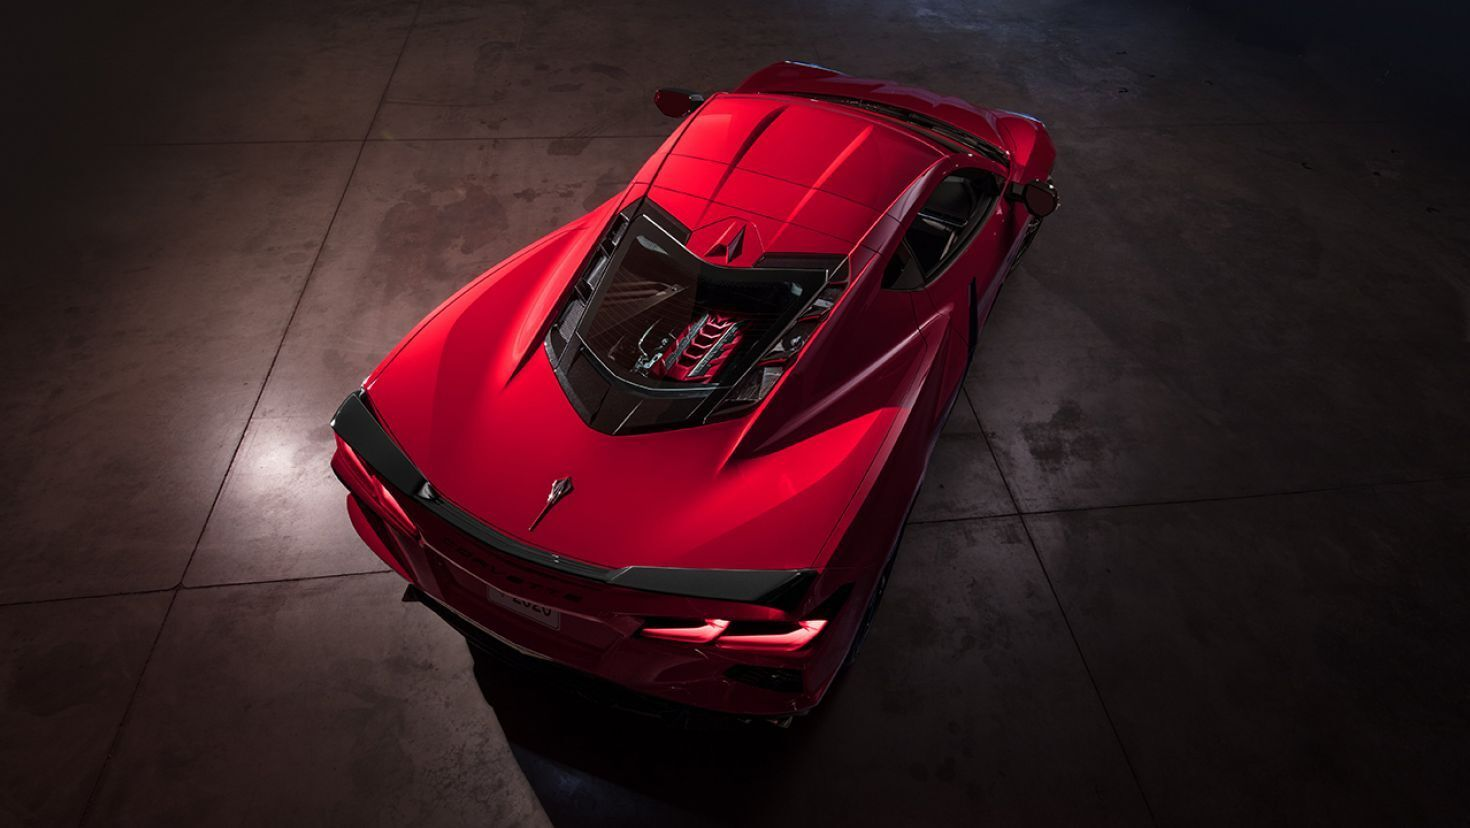 2020 Chevrolet Corvette Revealed With Mid Engine Design Bargain Price Chevrolet Corvette Chevrolet Corvette Stingray Corvette Convertible